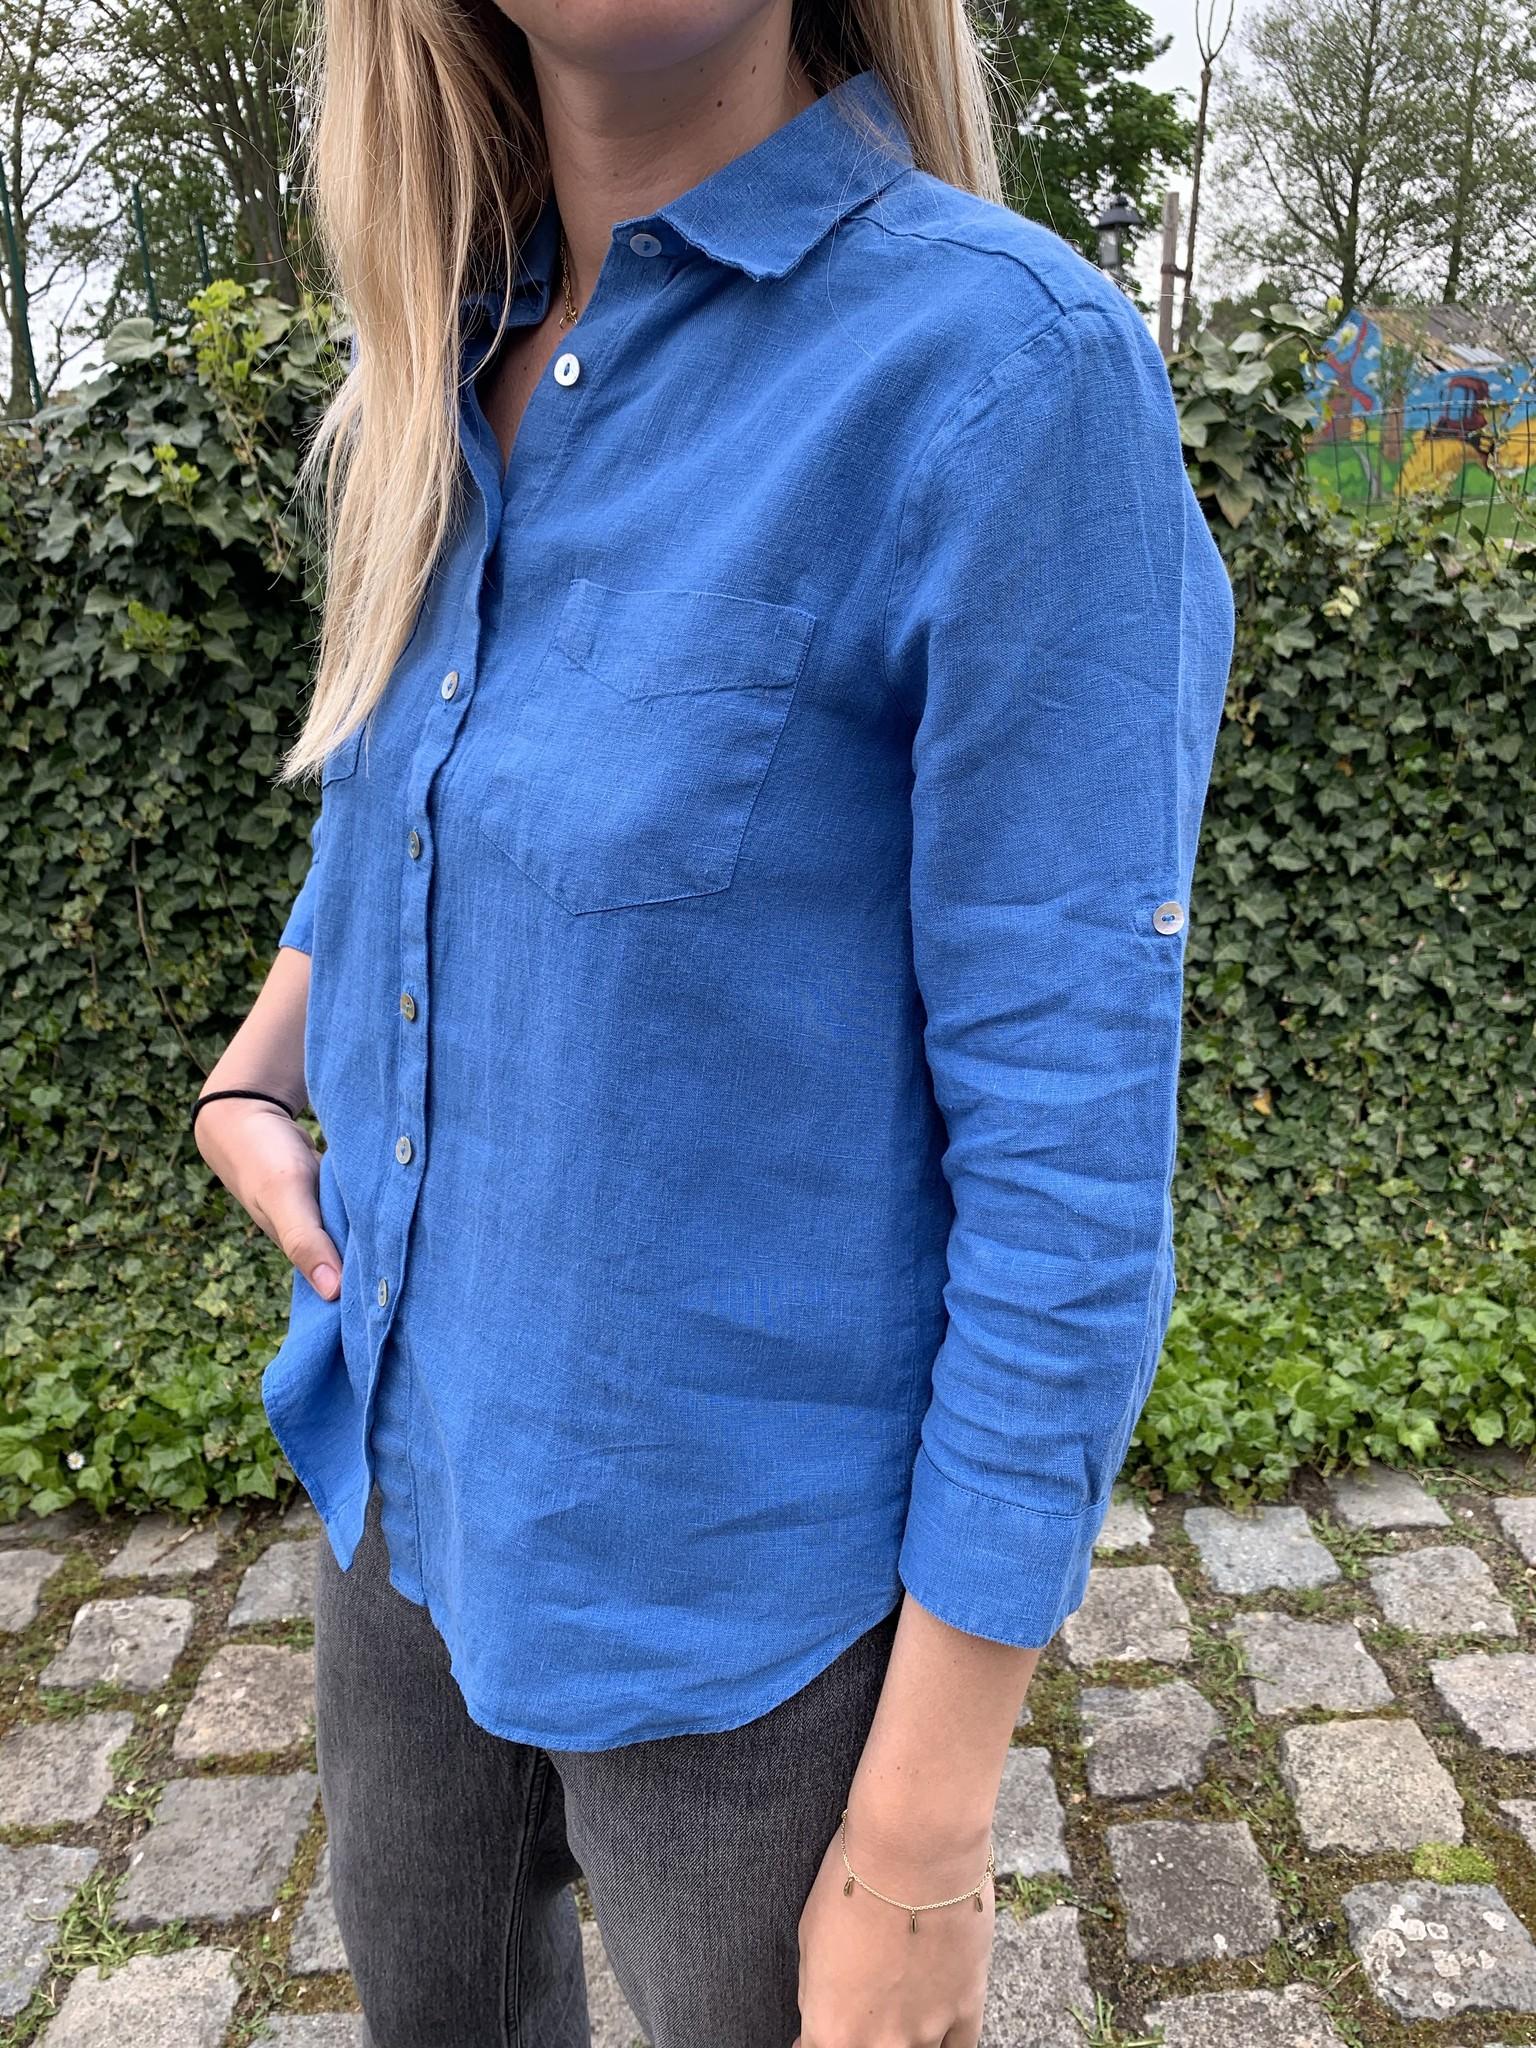 Le grenier du lin 3/4 mouwen puur linnen blouse blauw caraibes